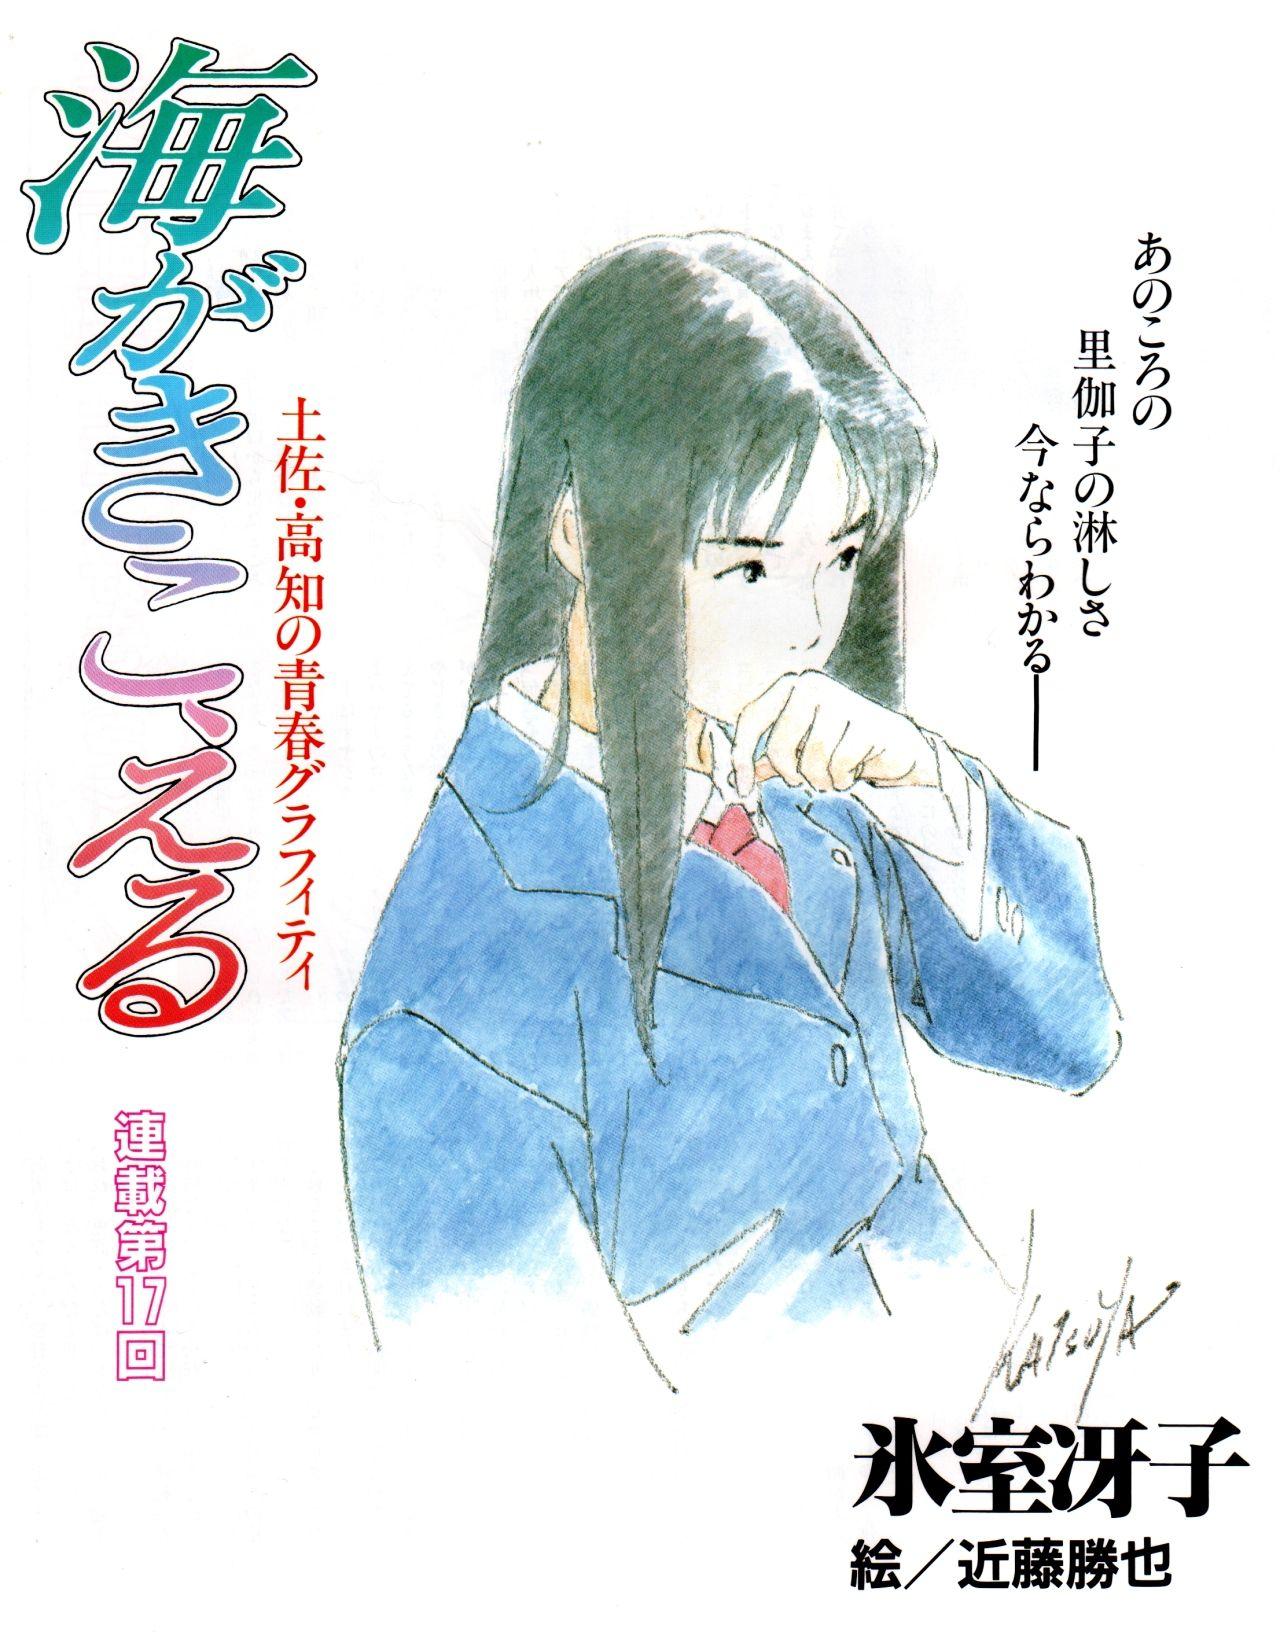 Animage (07/1991) Umi ga kikoeru/Ocean Waves novel